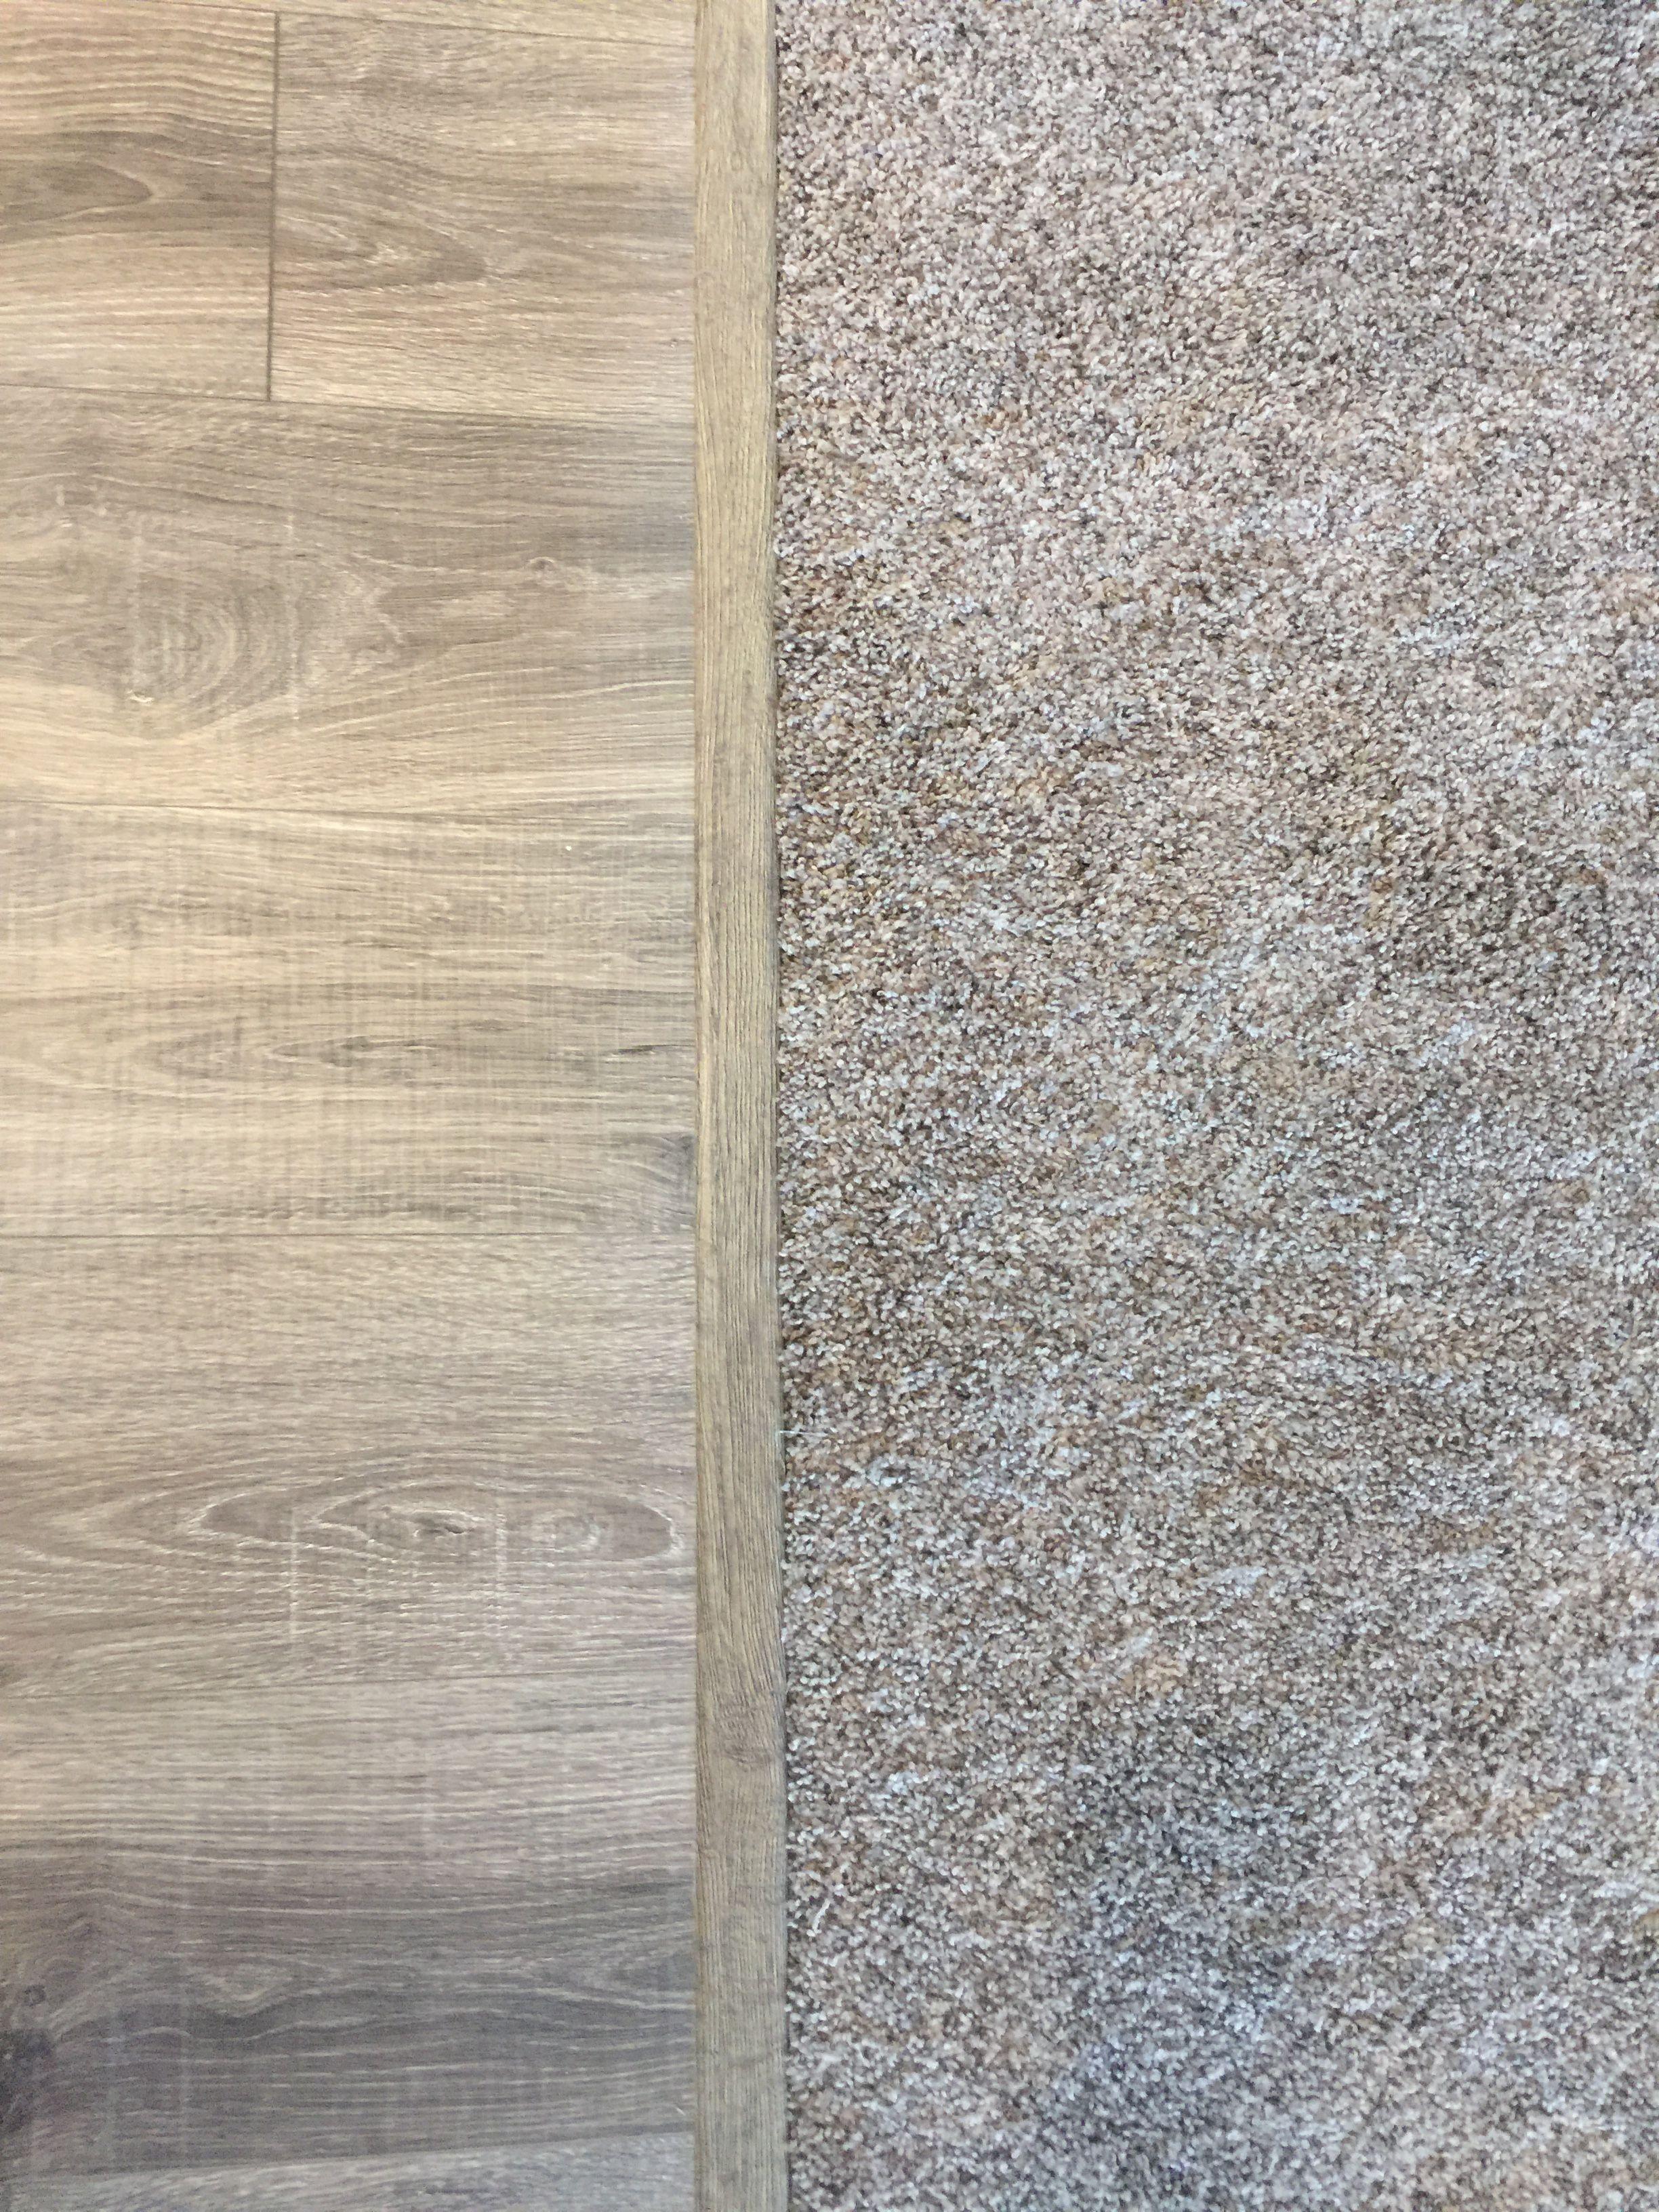 Best Laminate To Carpet Transitional Str*P Basement Flooring 400 x 300